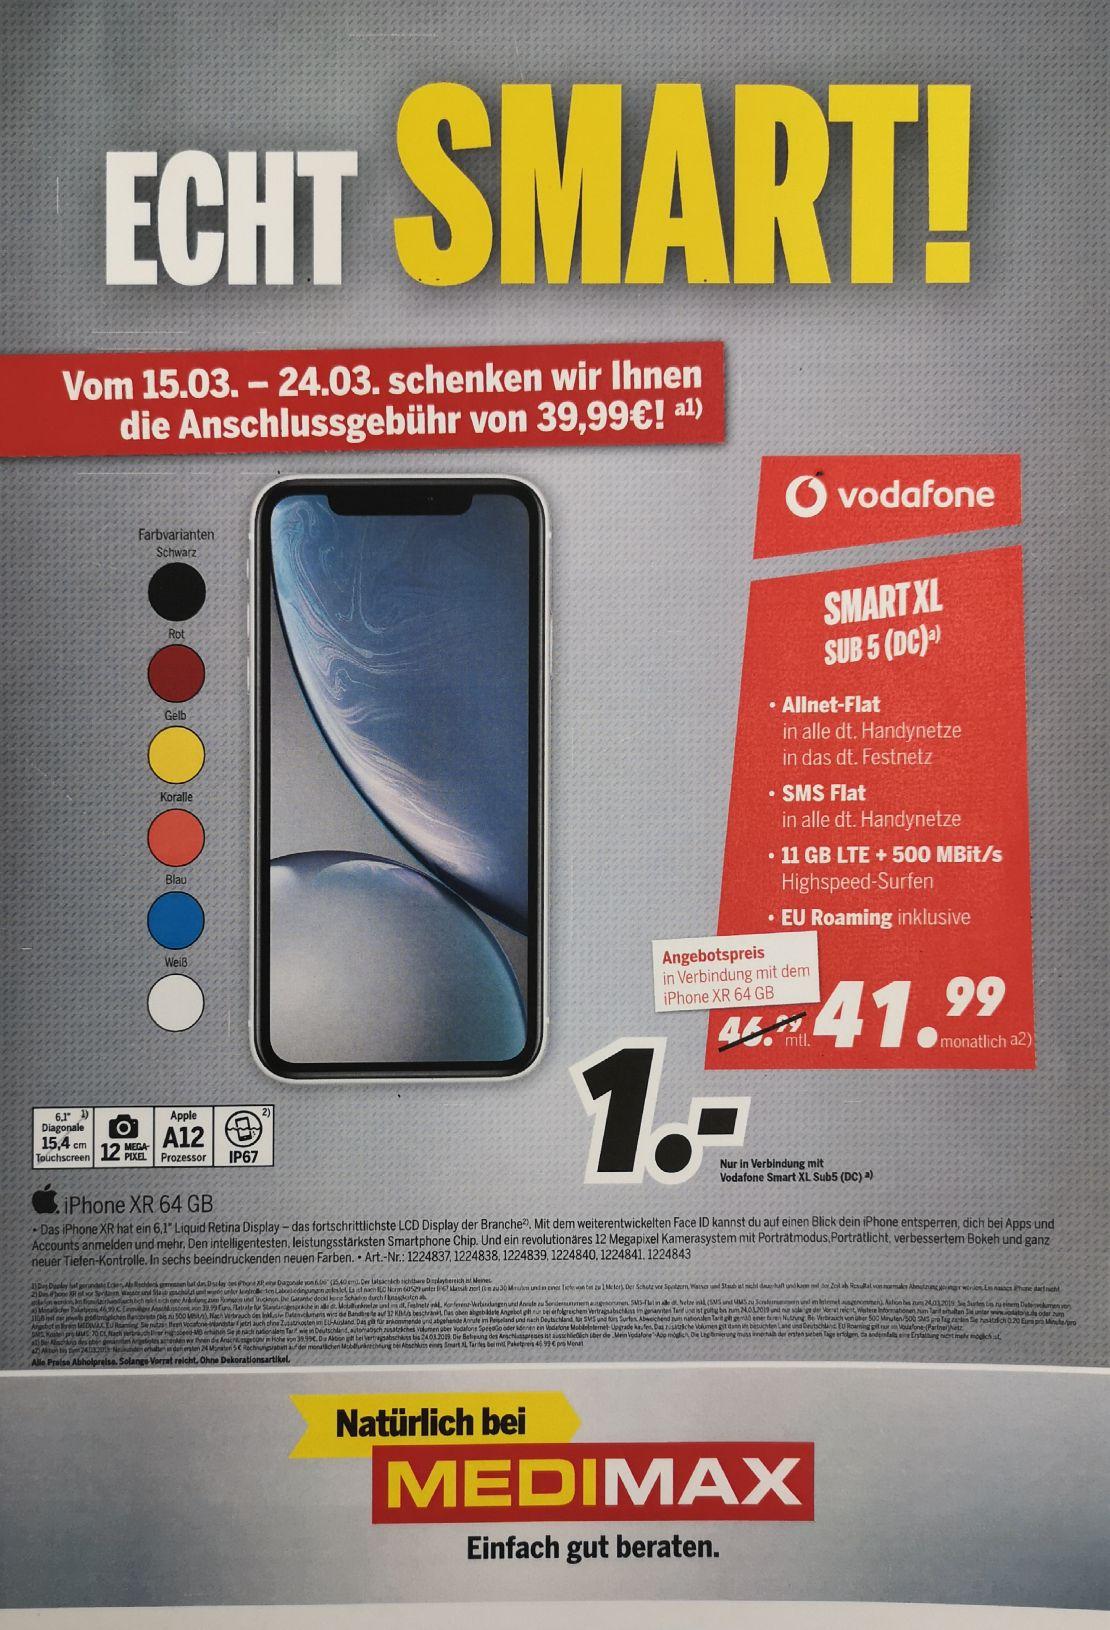 IPhone XR 64GB 1€ mit 11GB Vodafone Vertrag mtl. 41,99€ + AP frei (Smart XL)